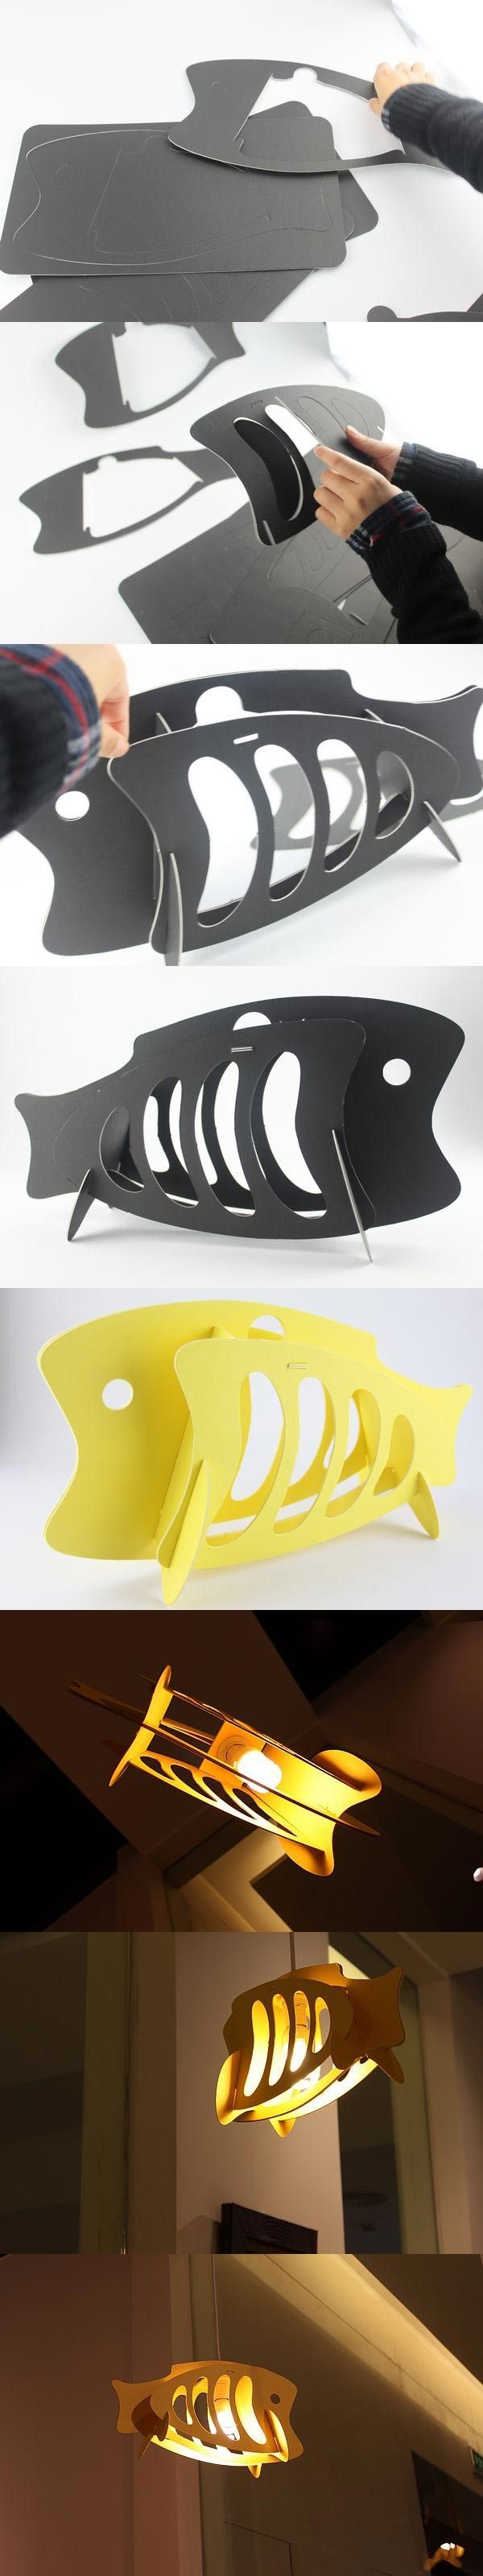 DIY鱼型挂饰灯,挂在家里还是蛮不错哟,